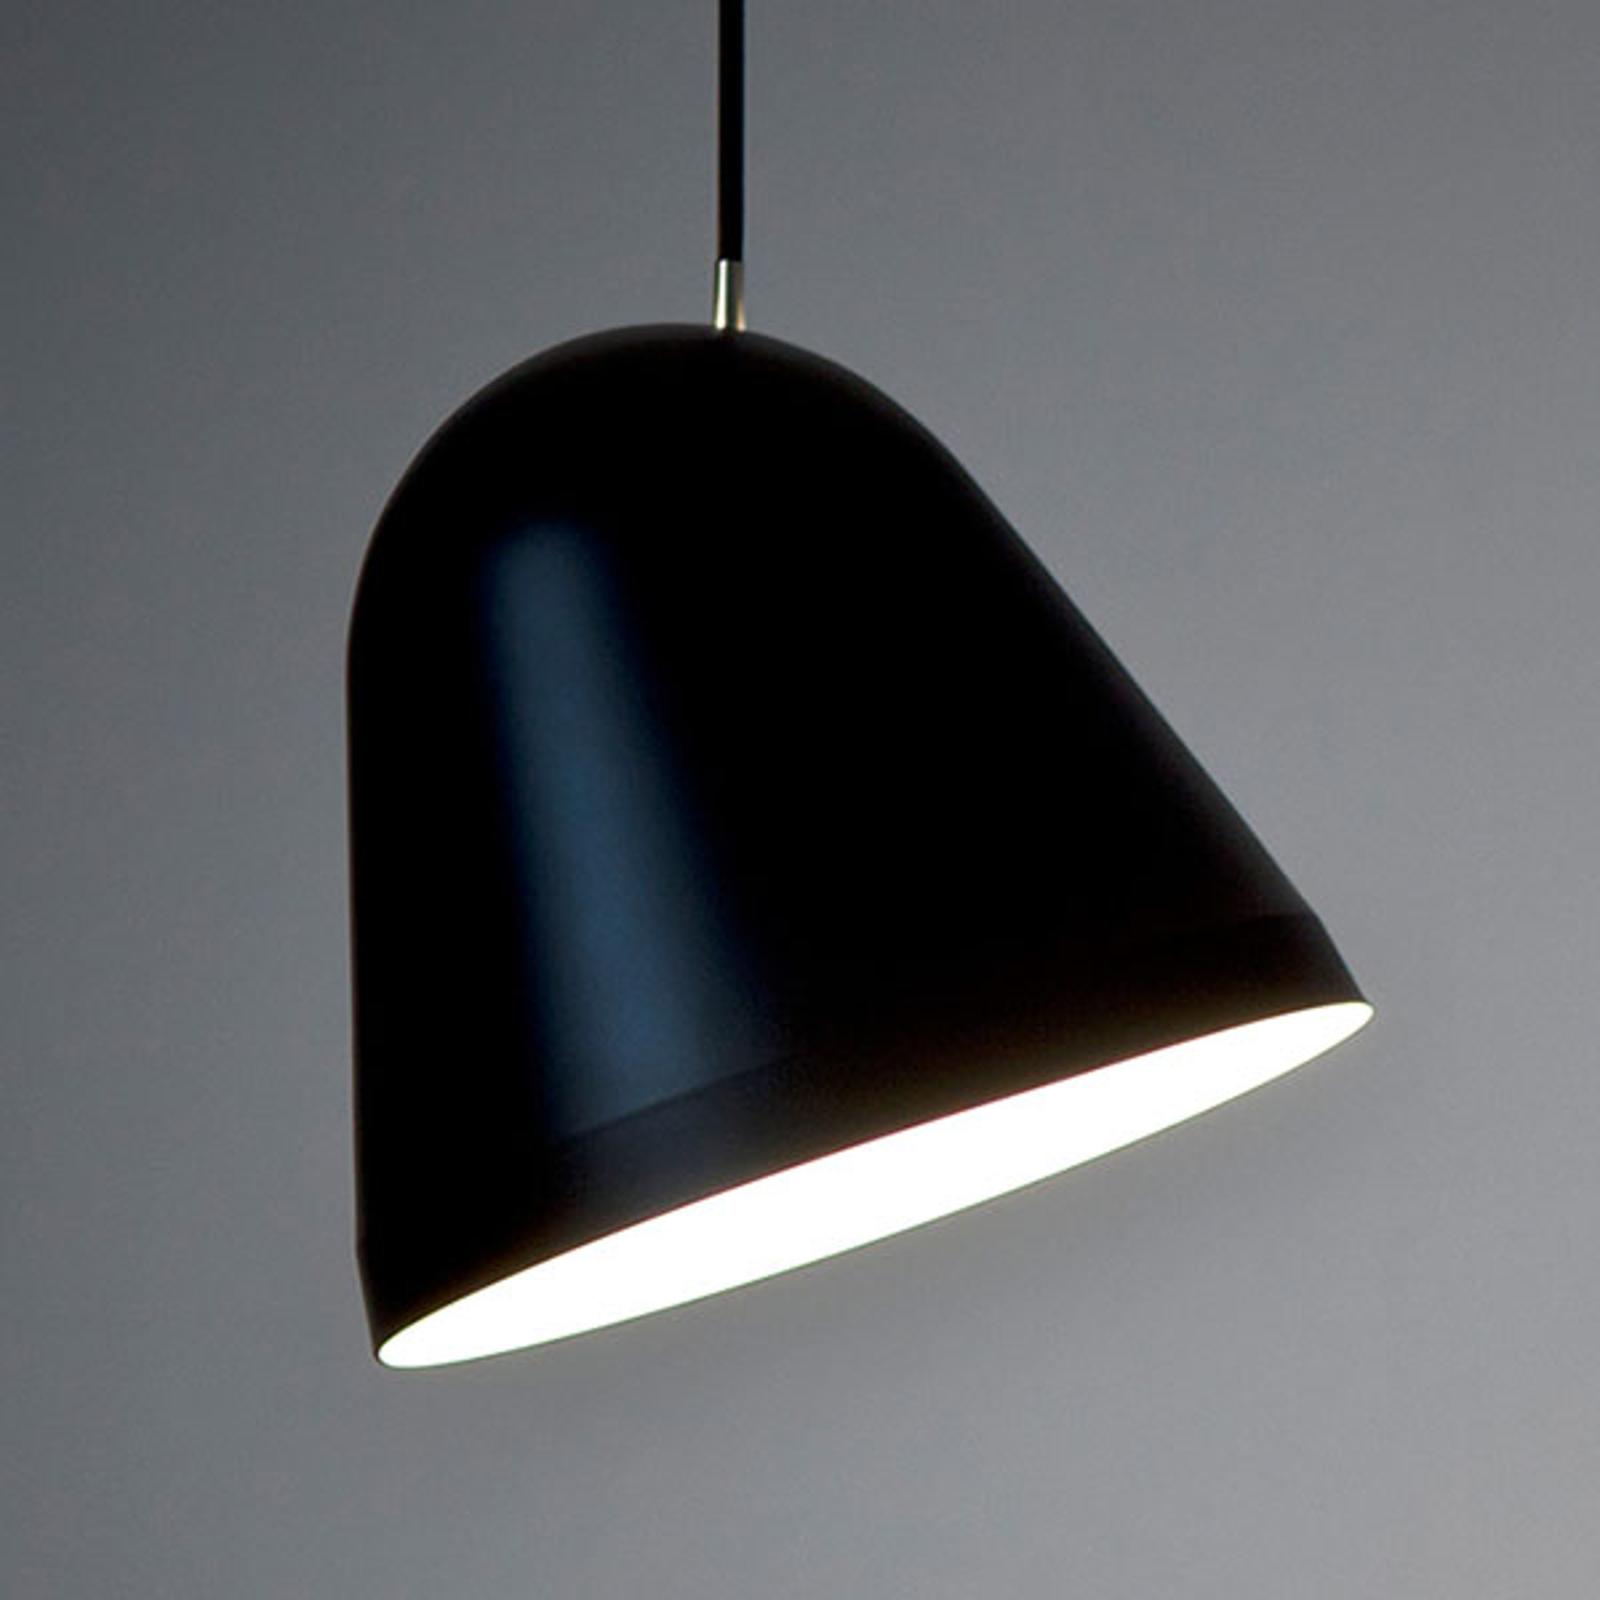 Nyta Tilt hanglamp, kabel 3m zwart, zwart